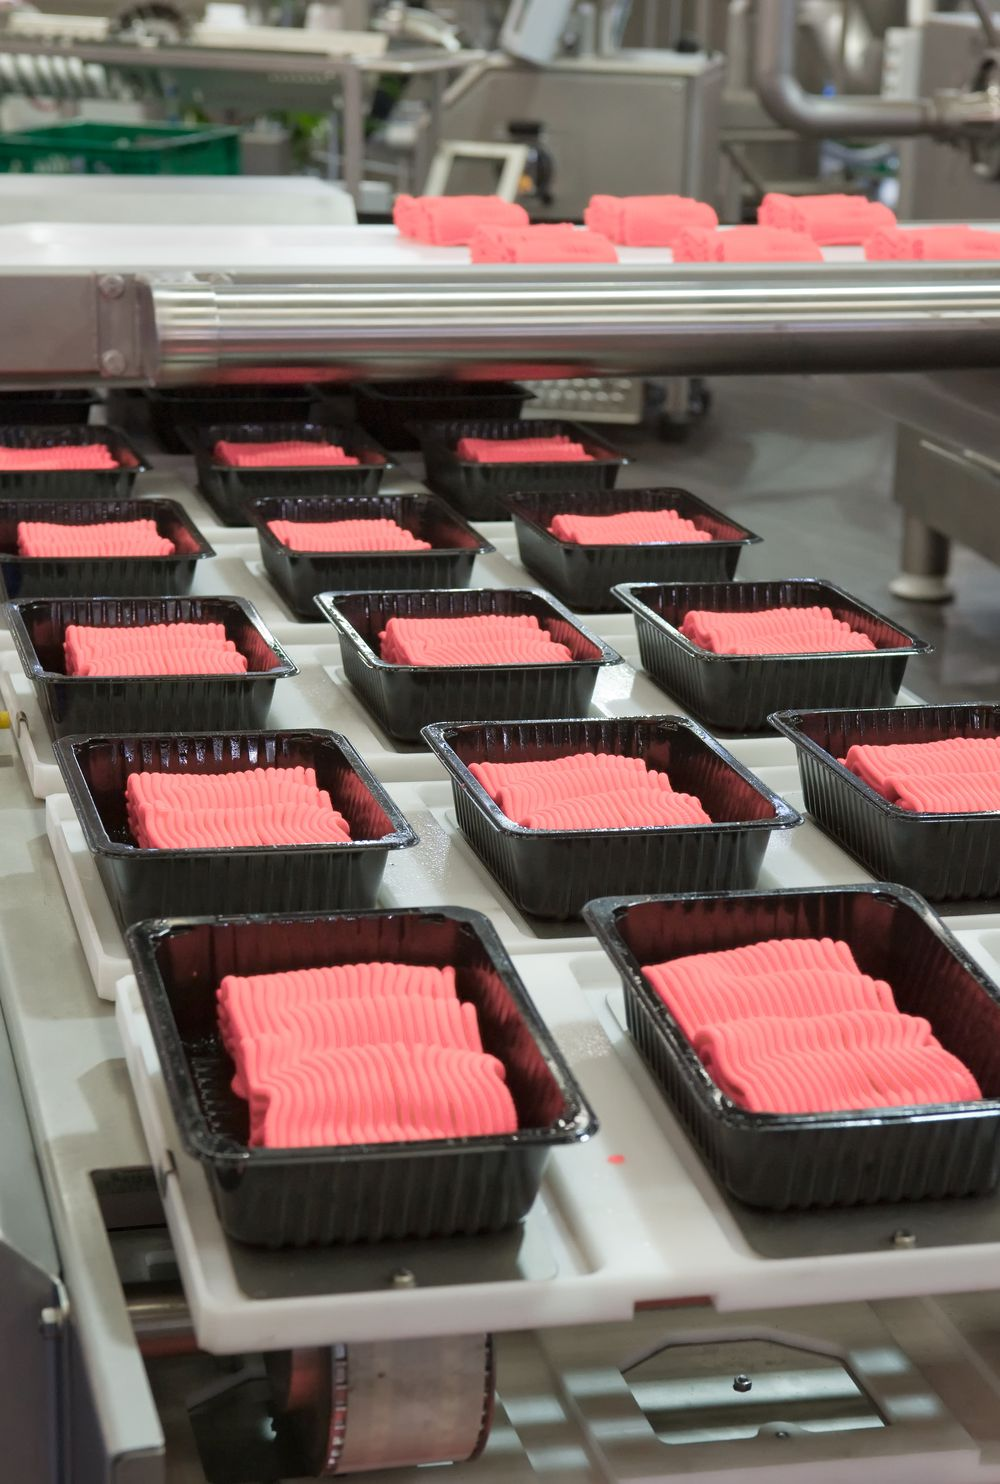 Industrielle lebensmittelproduktion italian food tech for Cuisine industrielle